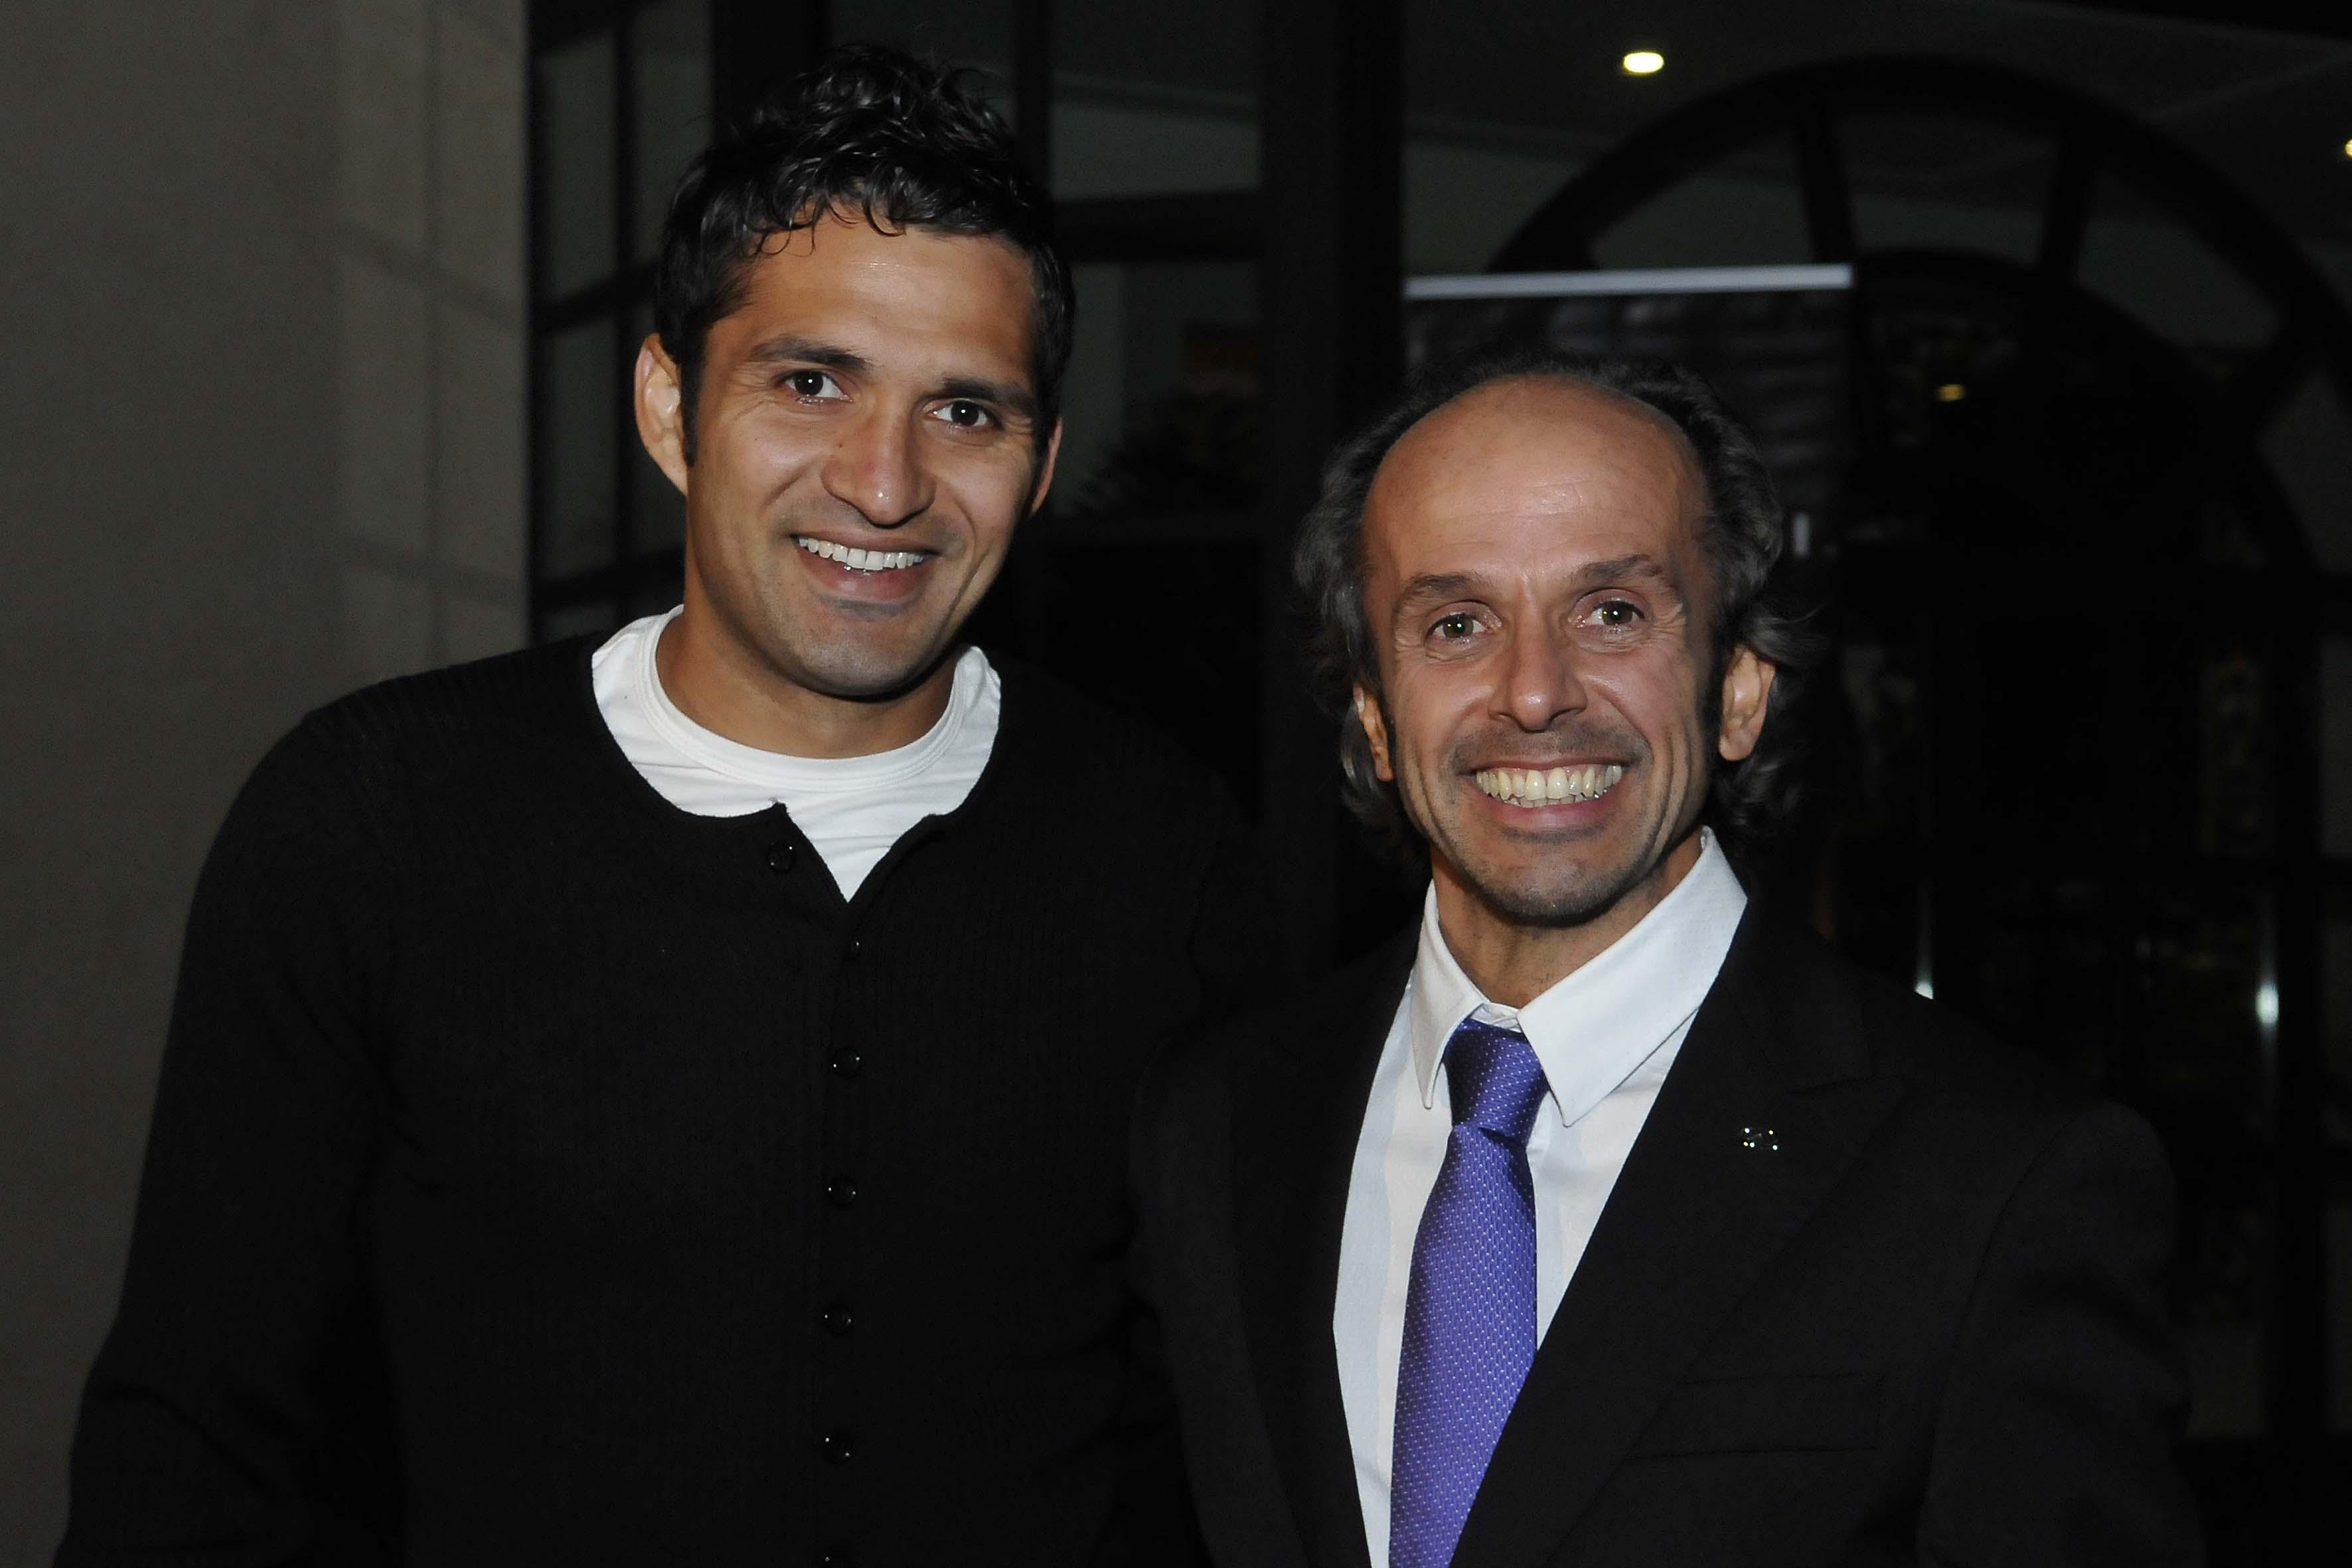 M.A. Santana e Marco Ambrosetti